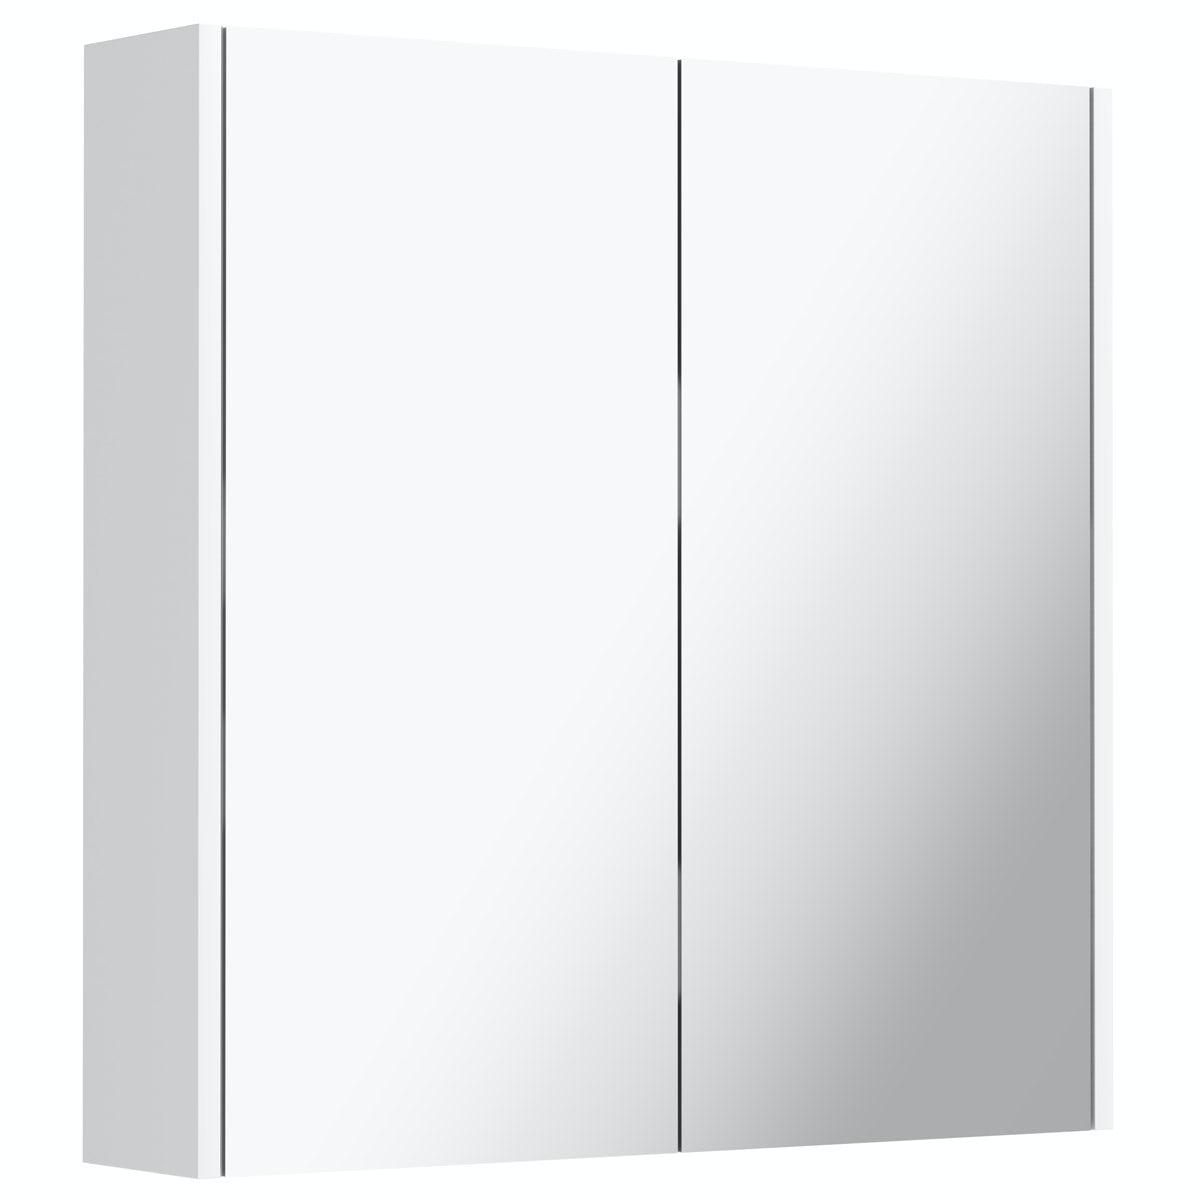 Mode Tate white mirror cabinet 600mm